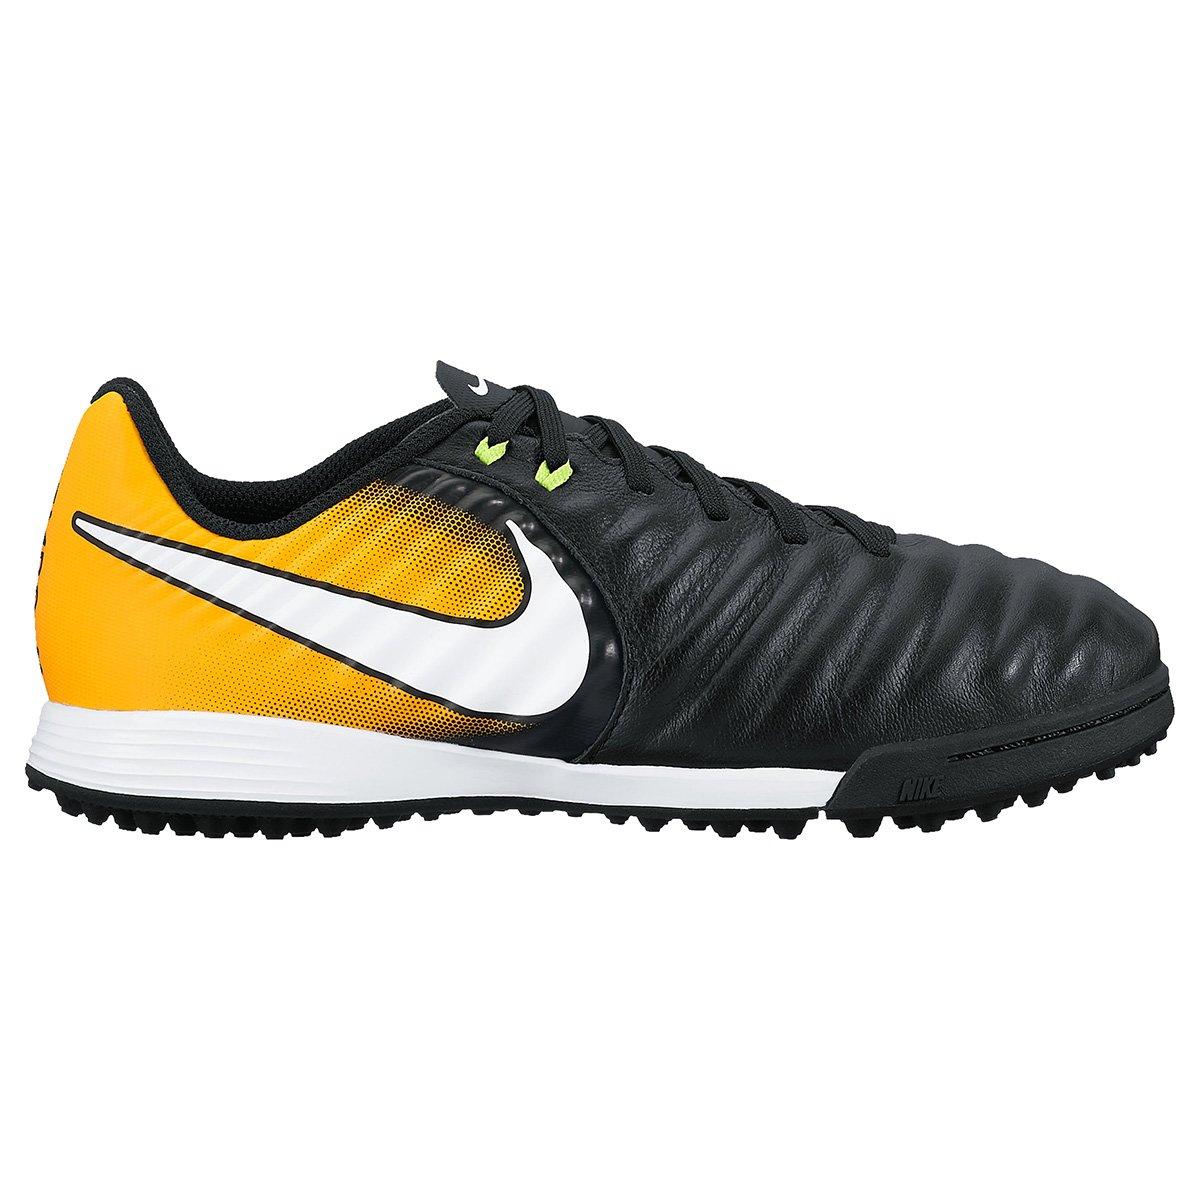 2cf606a812 Chuteira Society Infantil Nike Tiempo Ligera 4 TF - Compre Agora ...